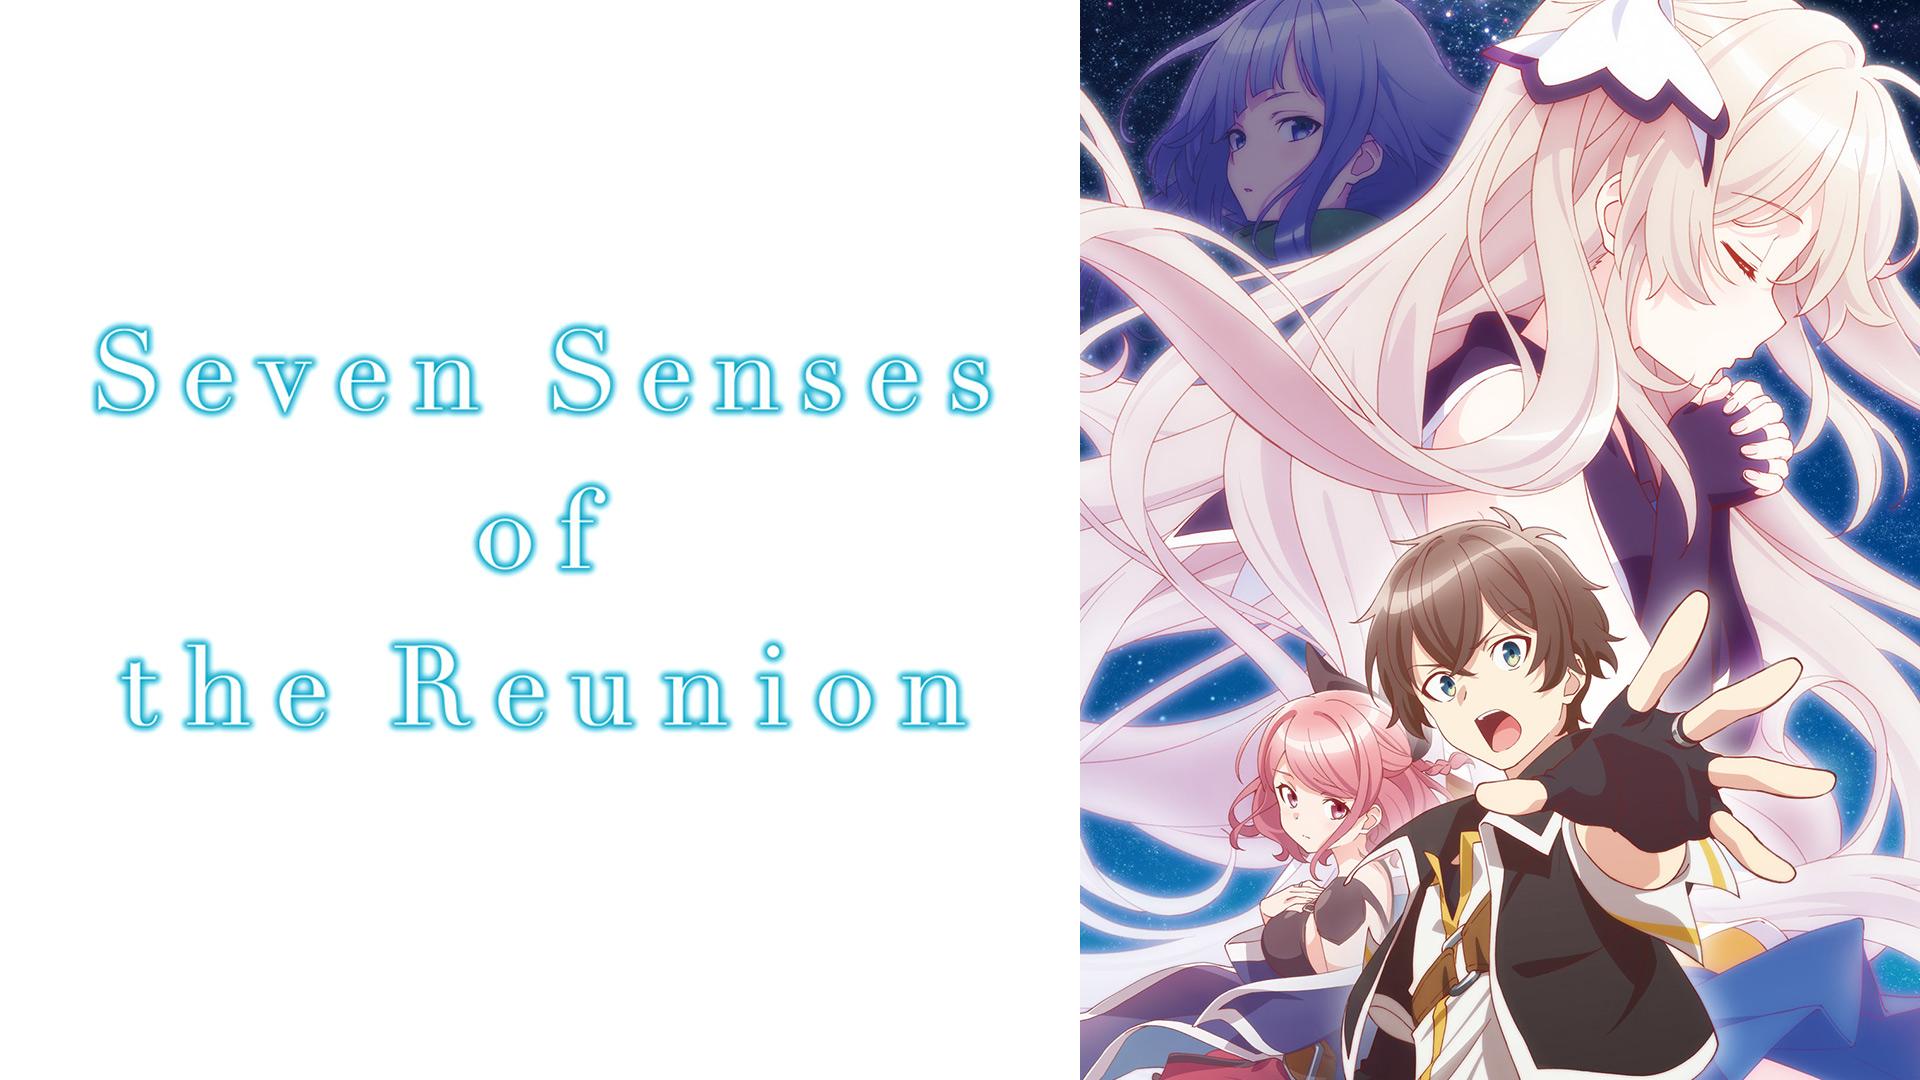 Seven Senses of the Re'Union